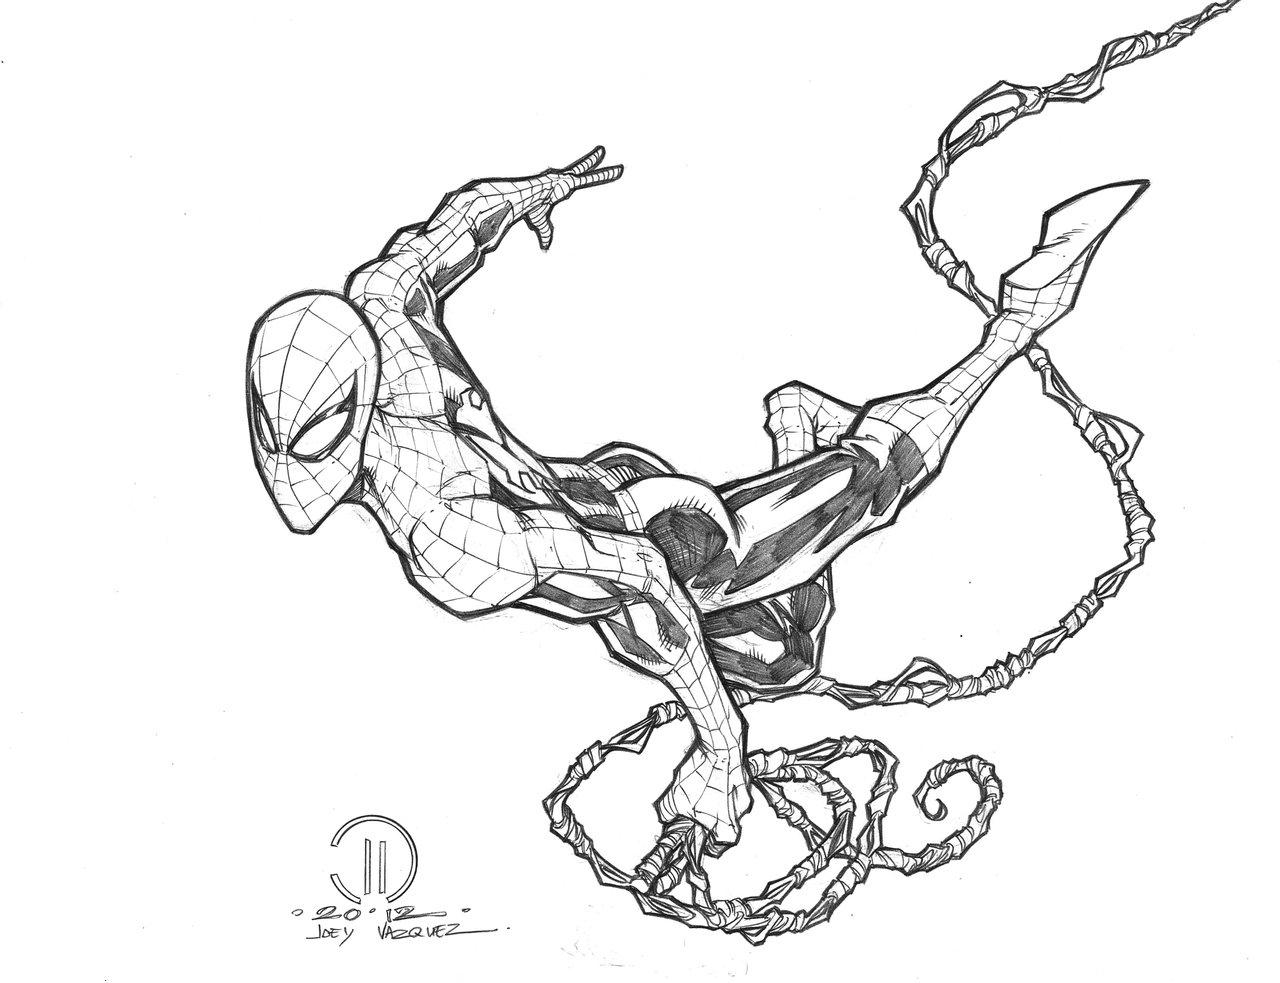 1280x983 Pencil Drawing Of Spiderman Spiderman Realistic Art, Pencil